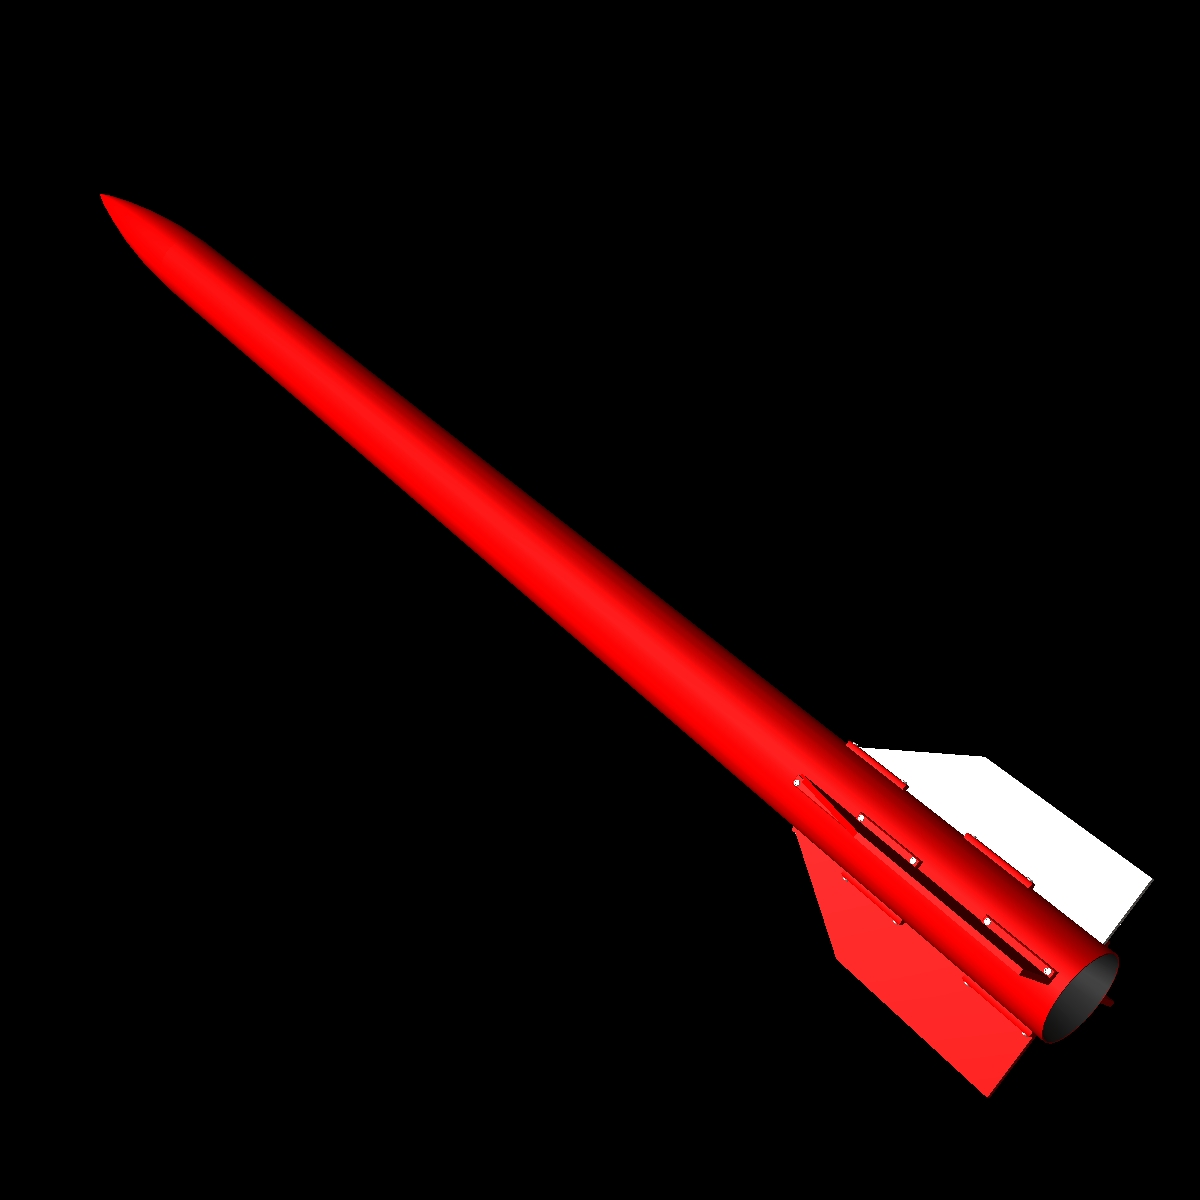 хар brant vi пуужин сонсогдож 3d загвар 3ds dxf cob x obj 150678